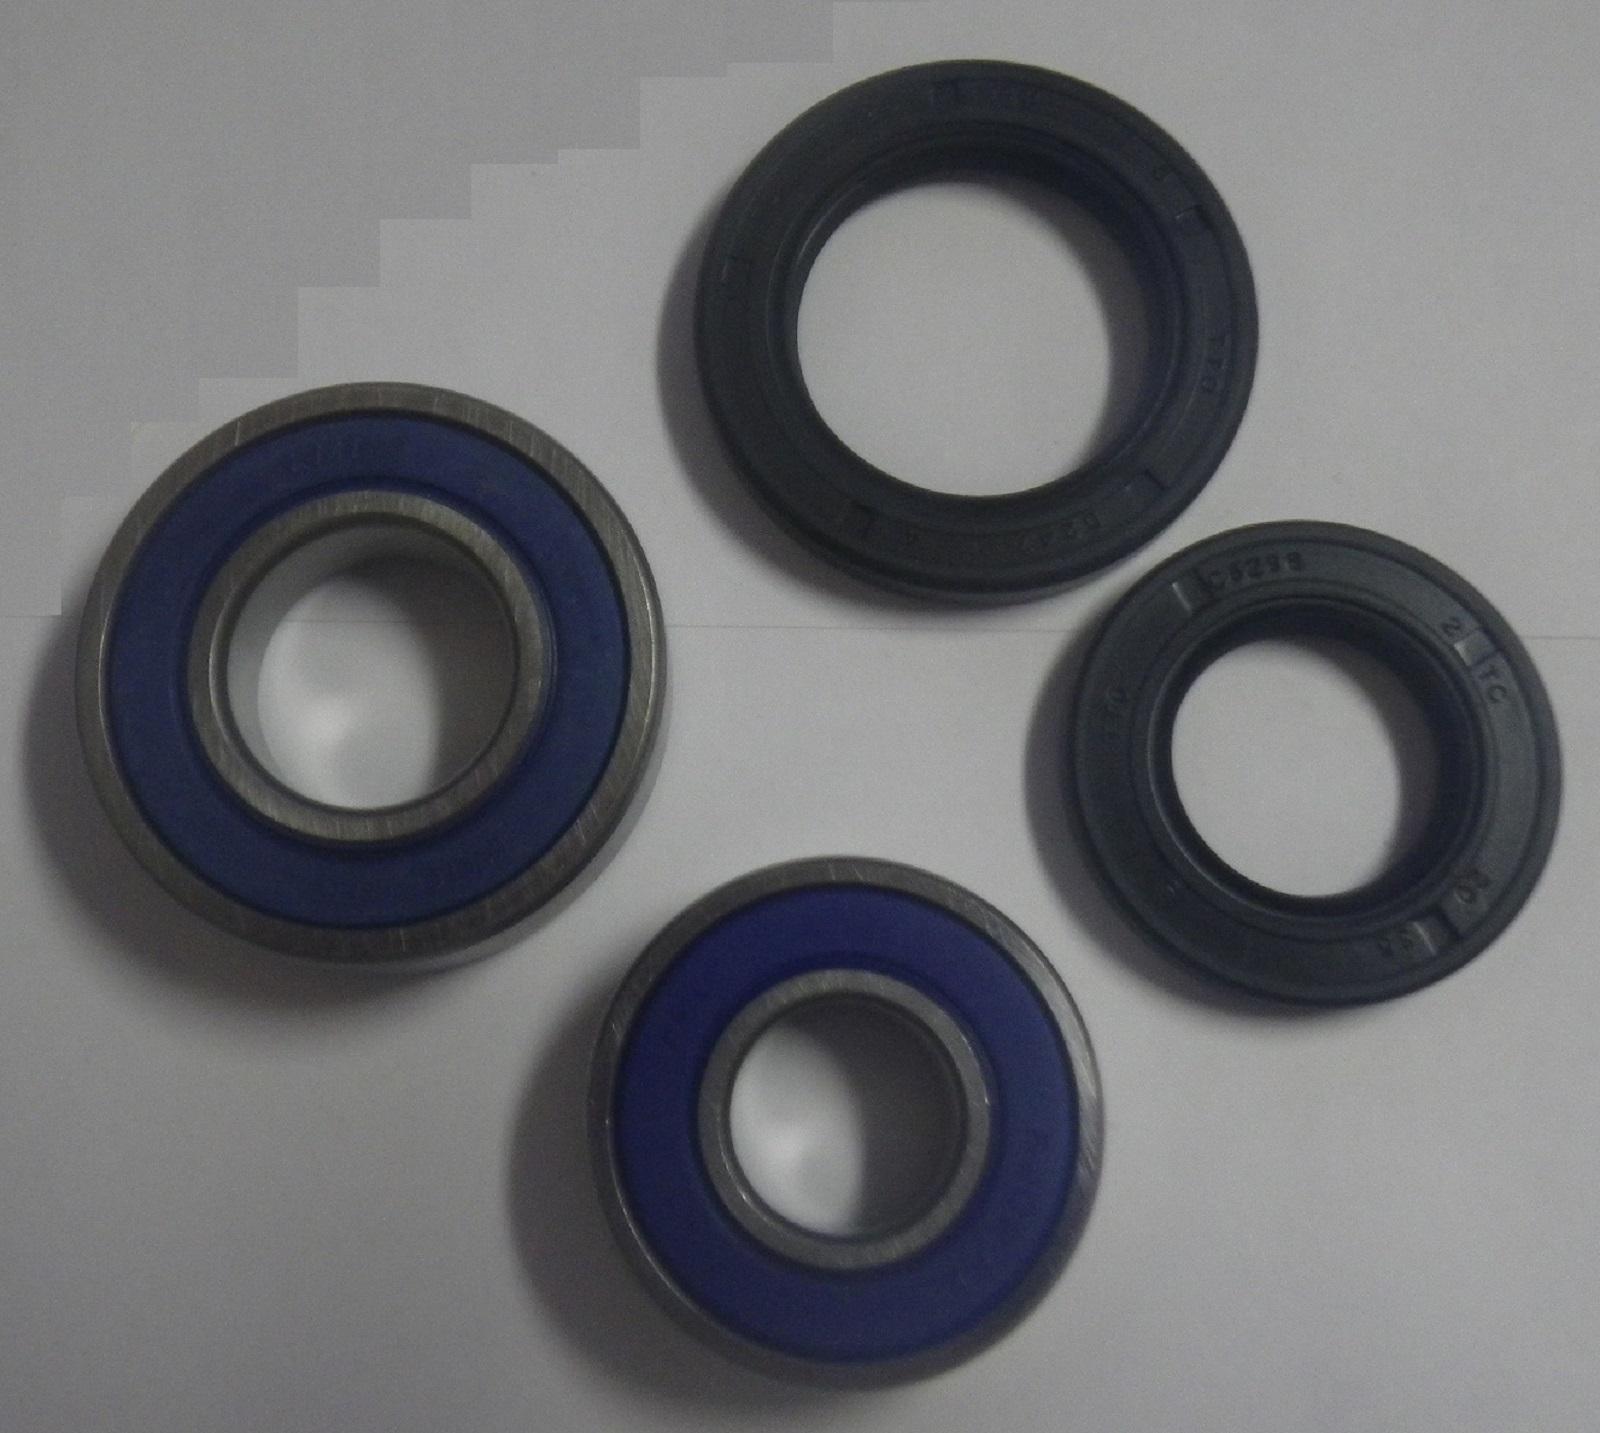 Honda TRX400EX Front Wheel Bearings and Seals Kit 1999-2008